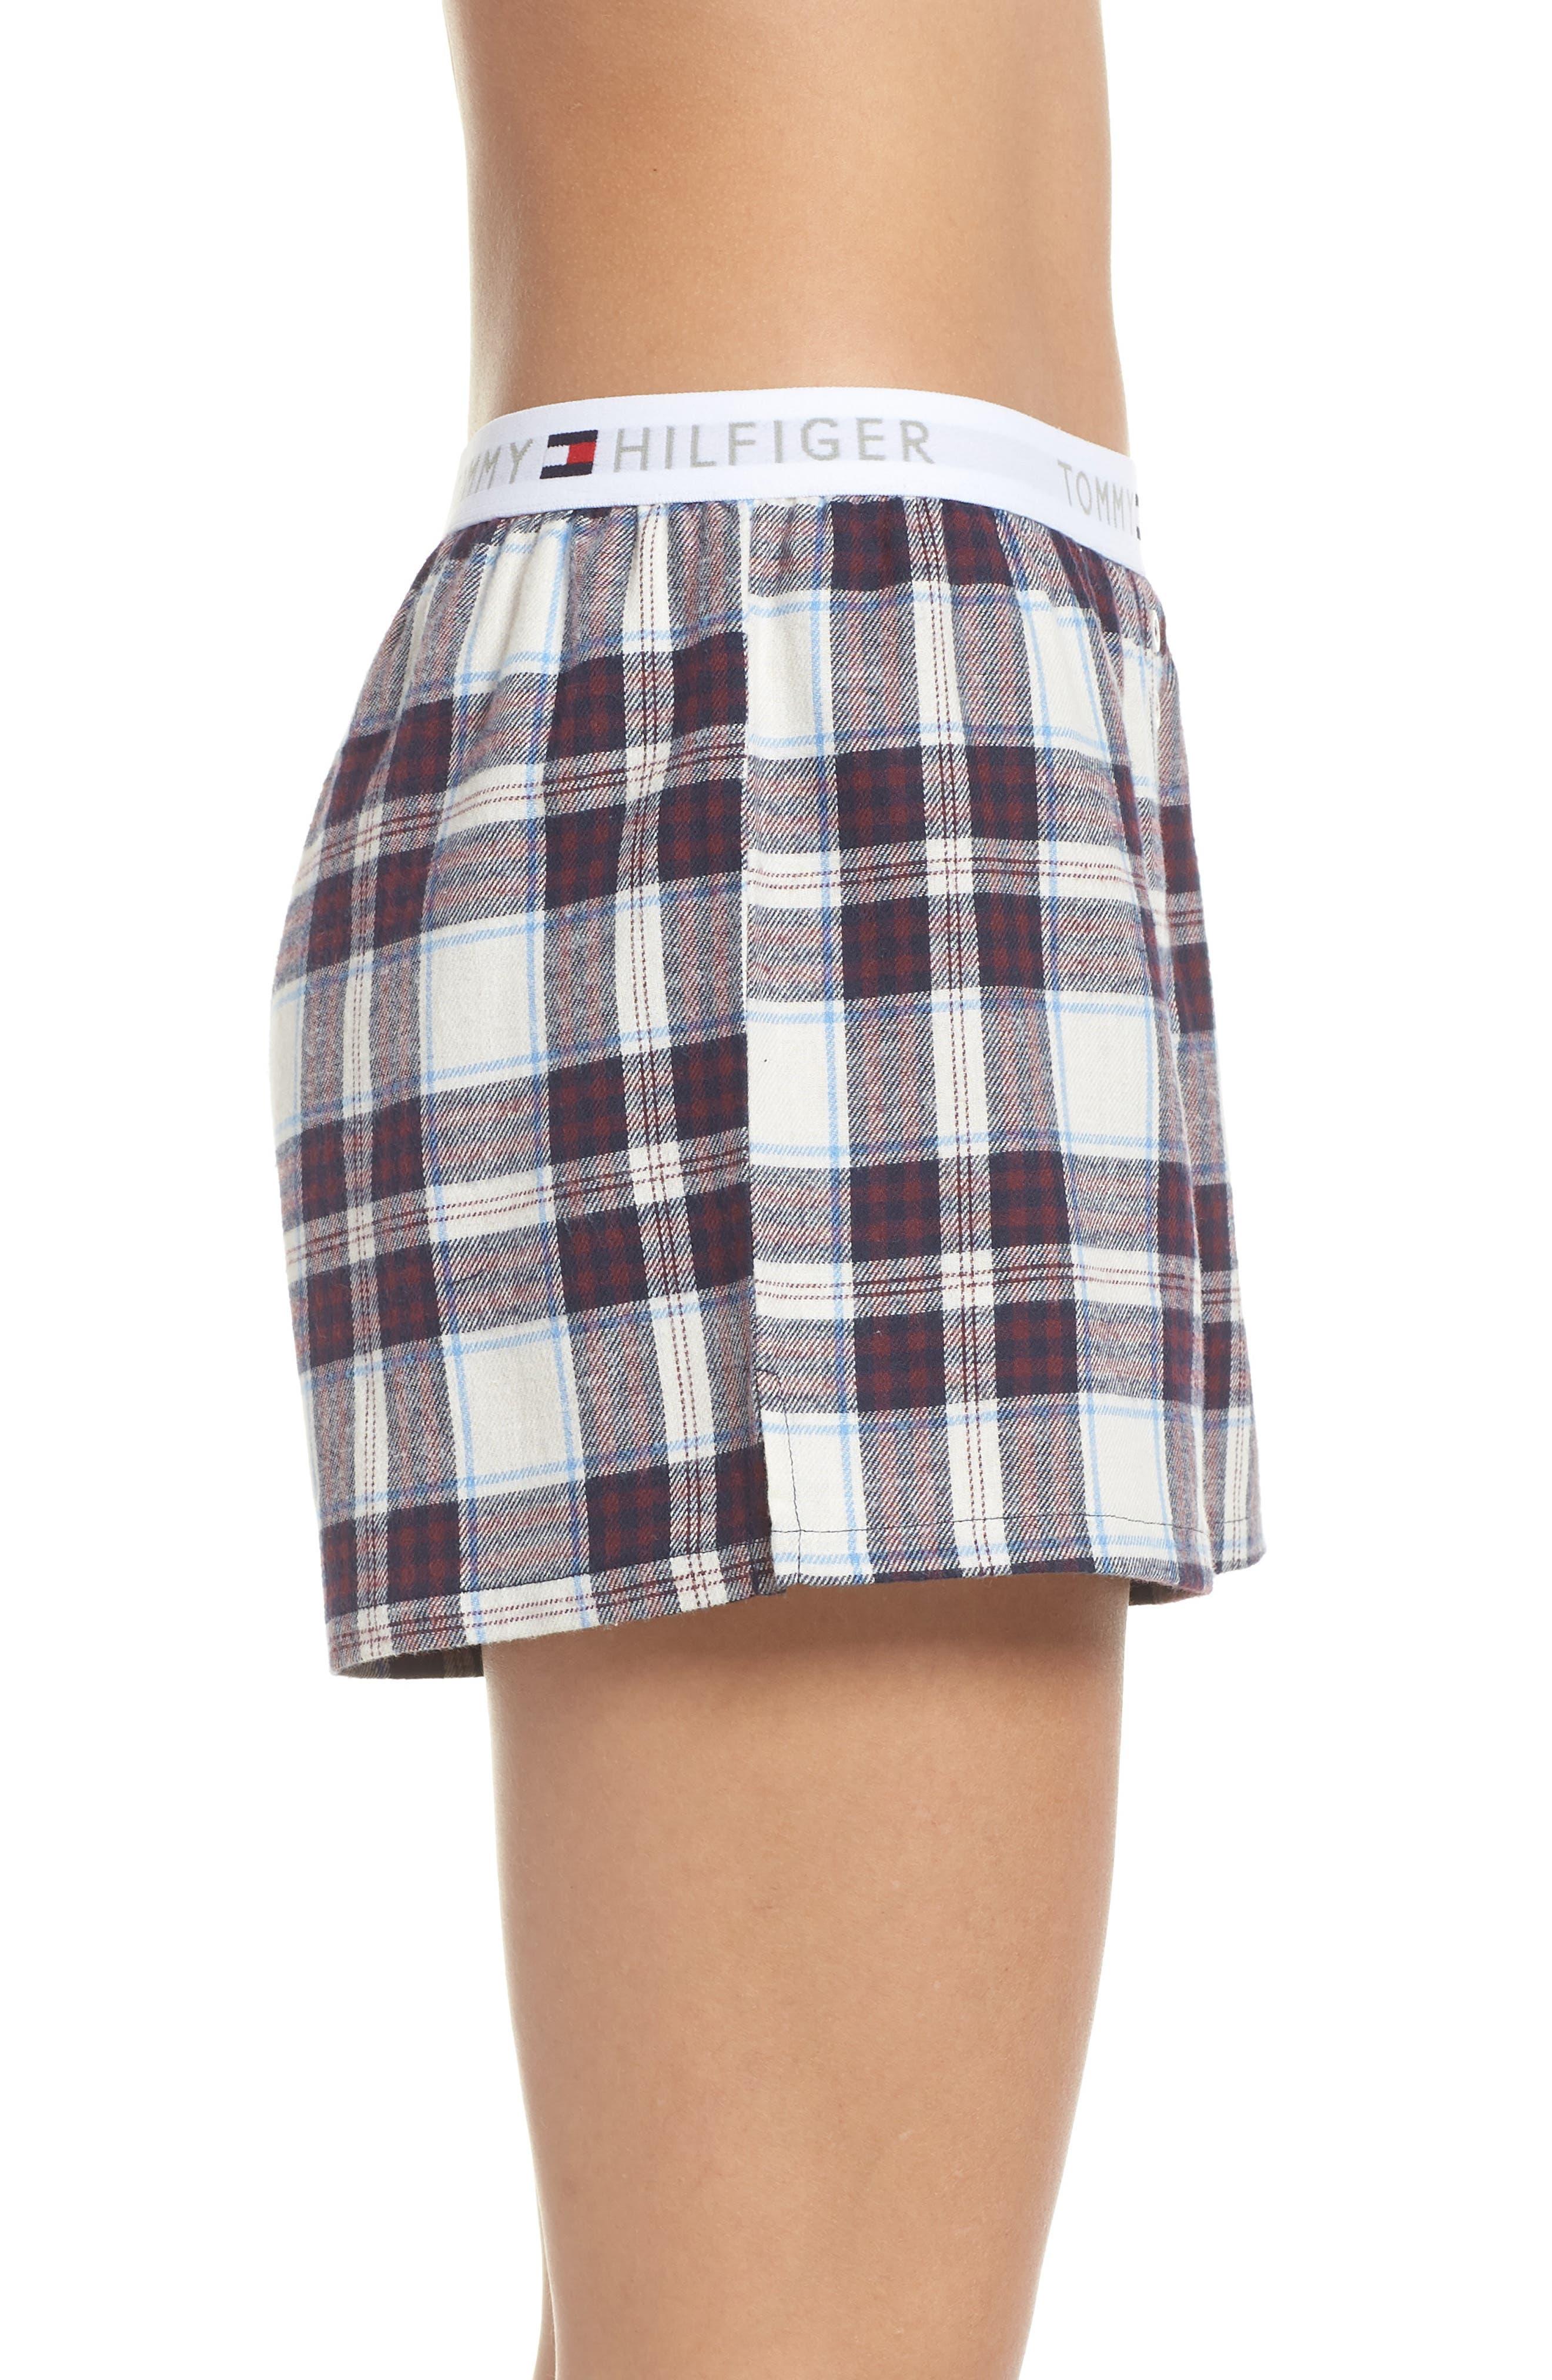 Plaid Pajama Shorts,                             Alternate thumbnail 3, color,                             SWEET DREAMS FIG TARTAN